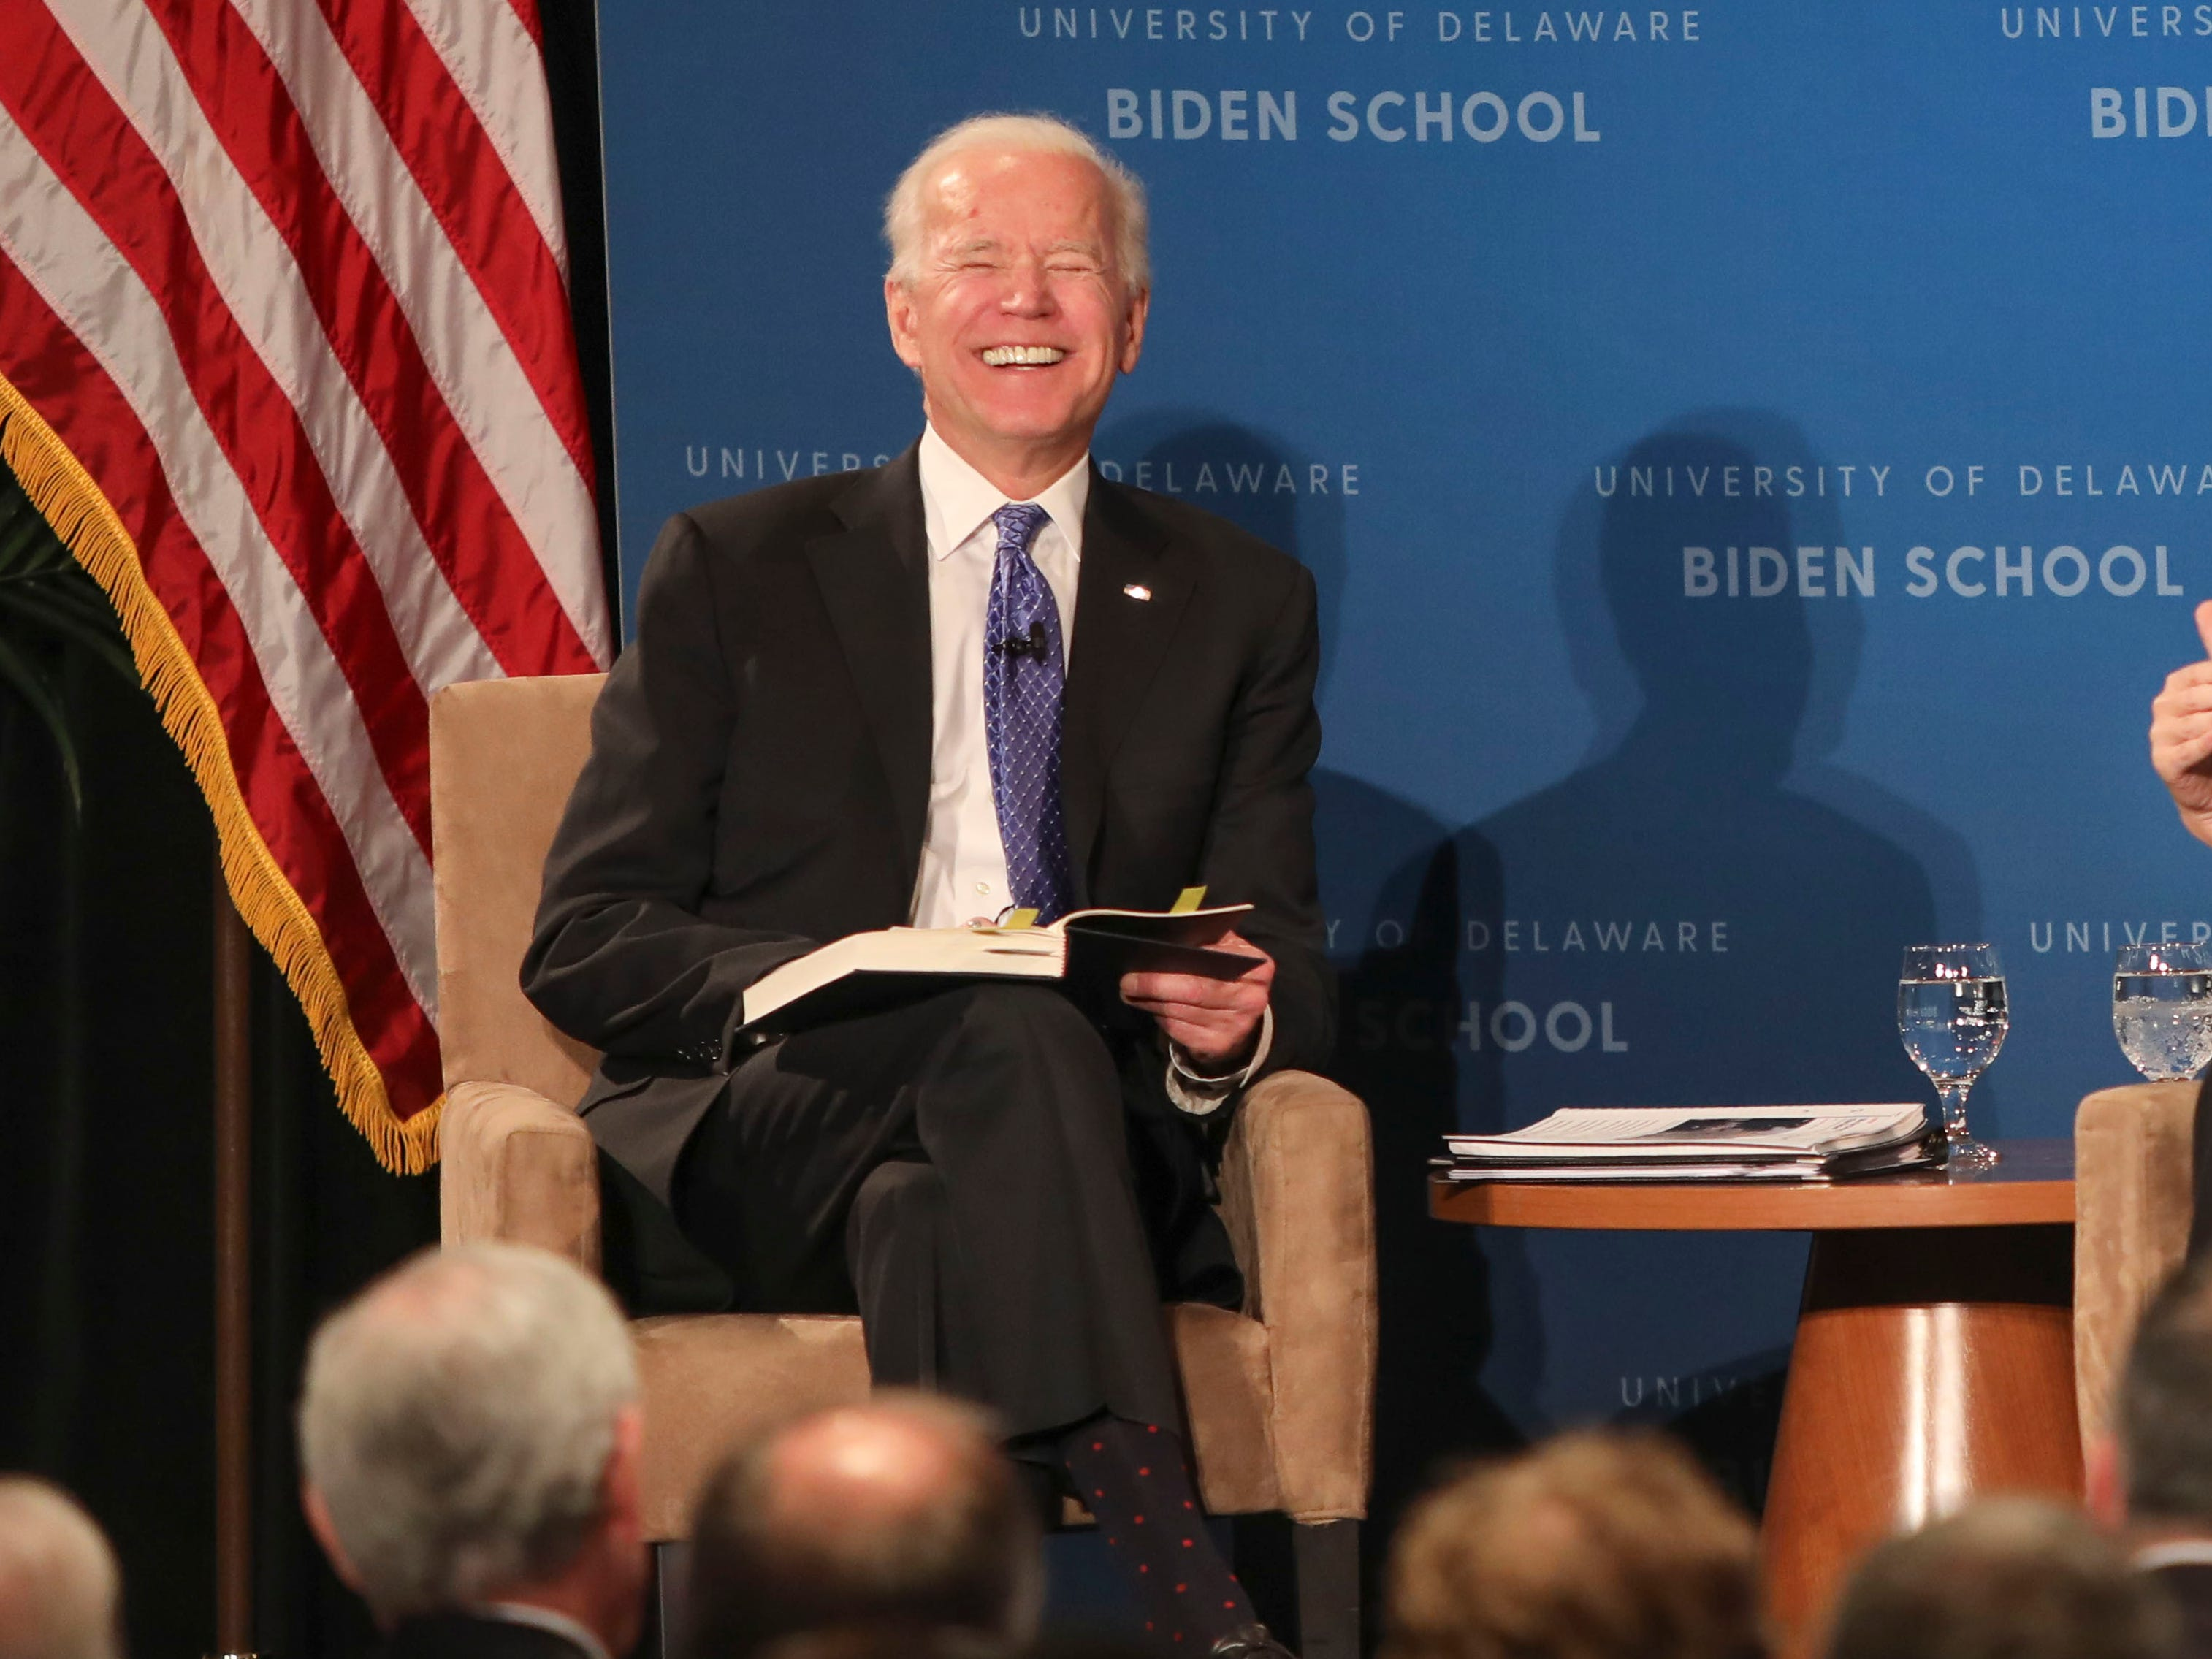 Iowa Poll: Not even in the race, Joe Biden leads Democrats; Sanders close behind